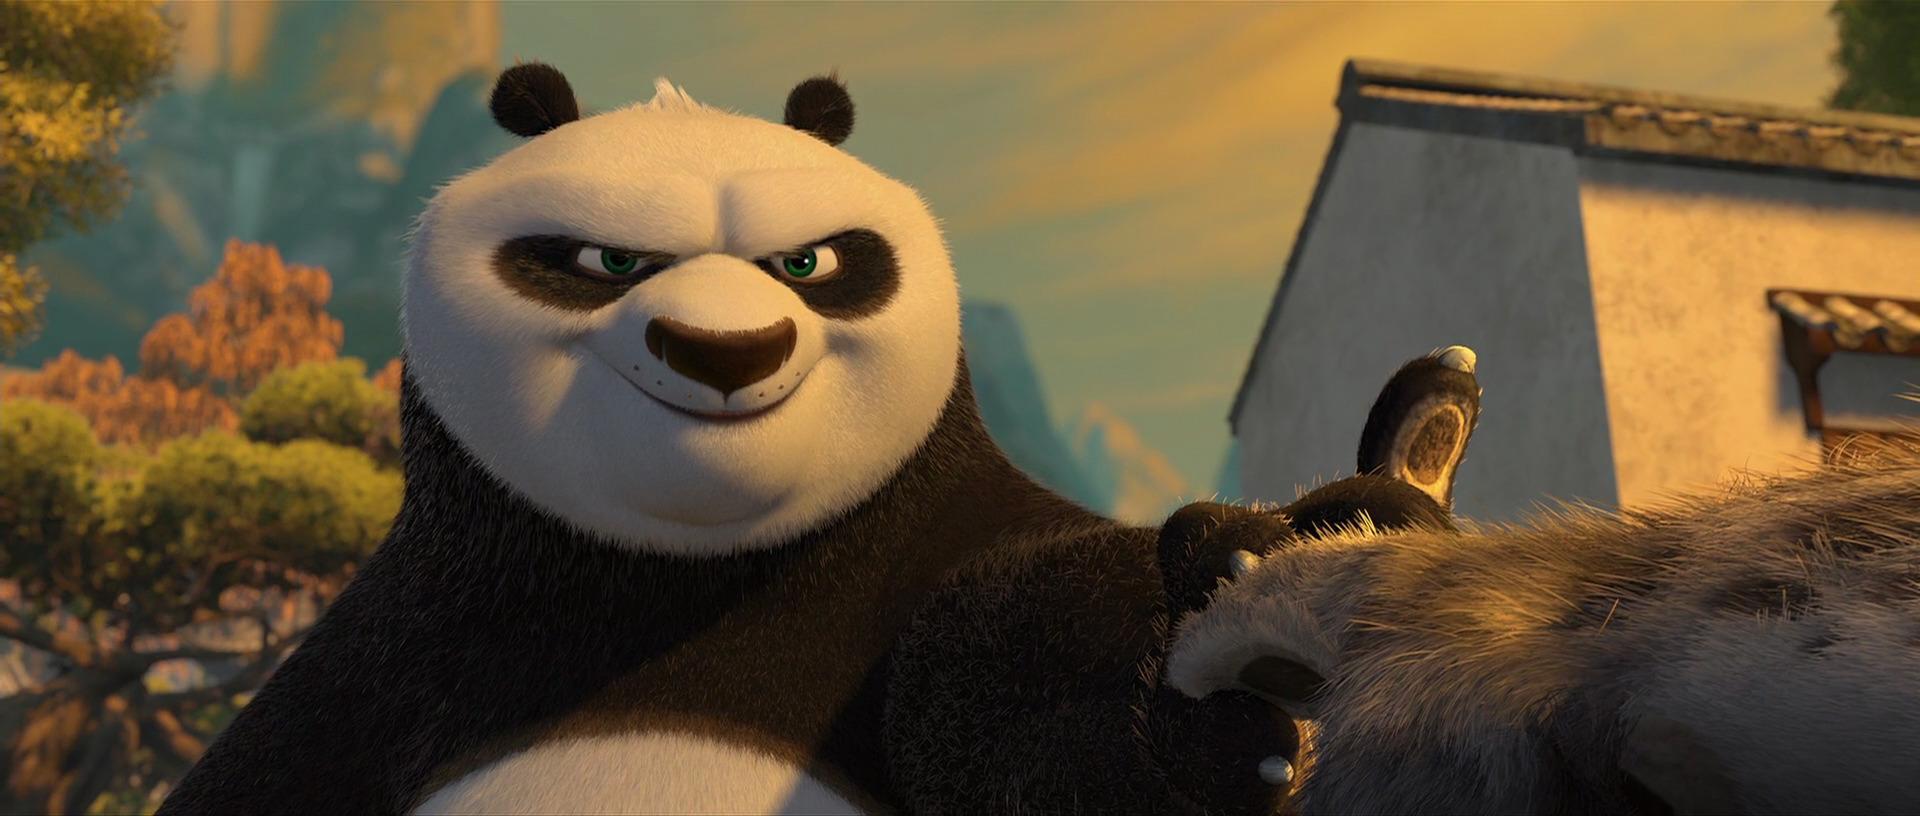 kung fu panda | kung fu panda wiki | fandom poweredwikia